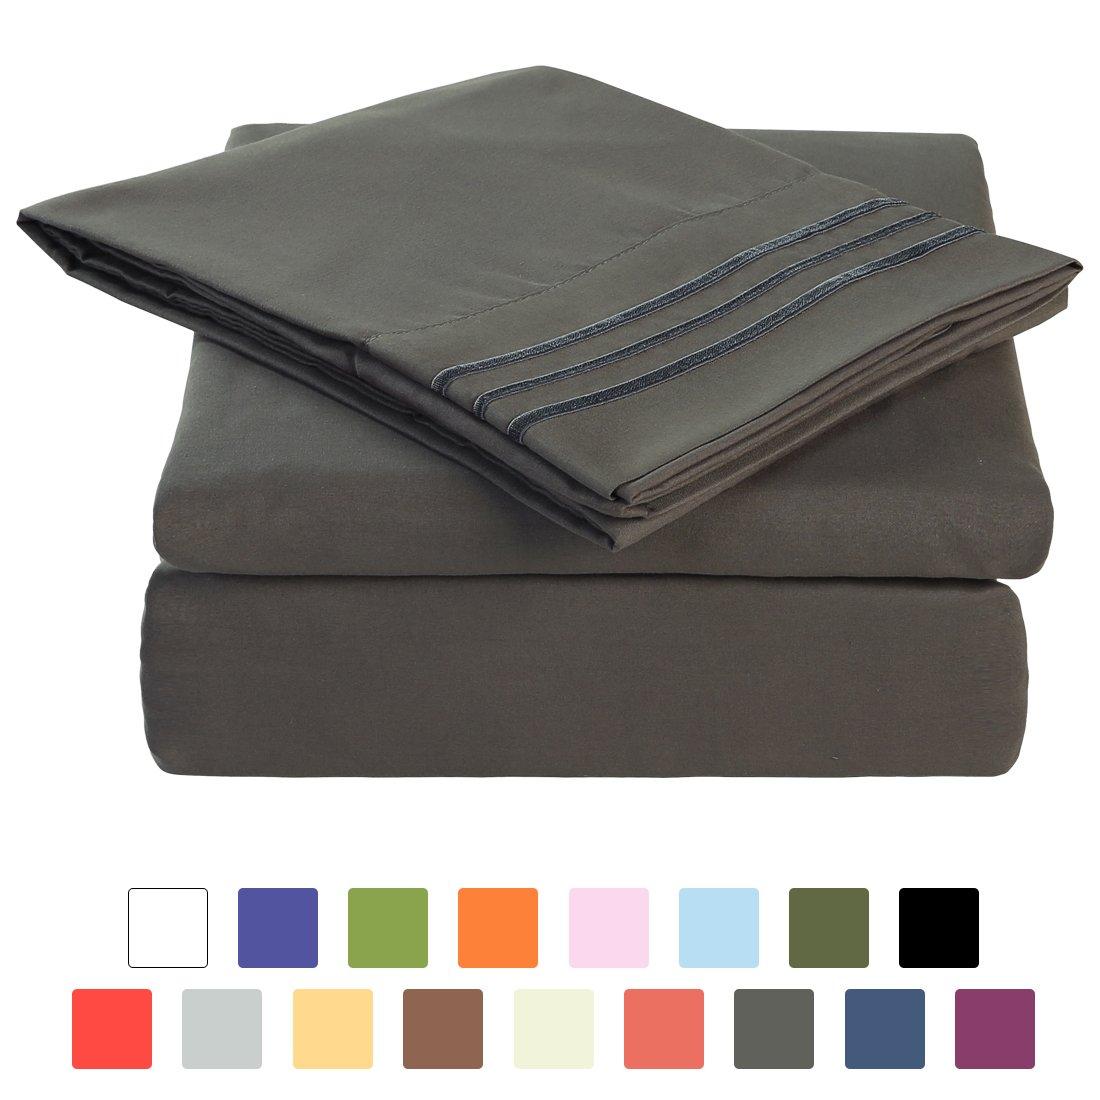 Blc Bed Sheet Set Hypoallergenic Microfiber 3 Piece